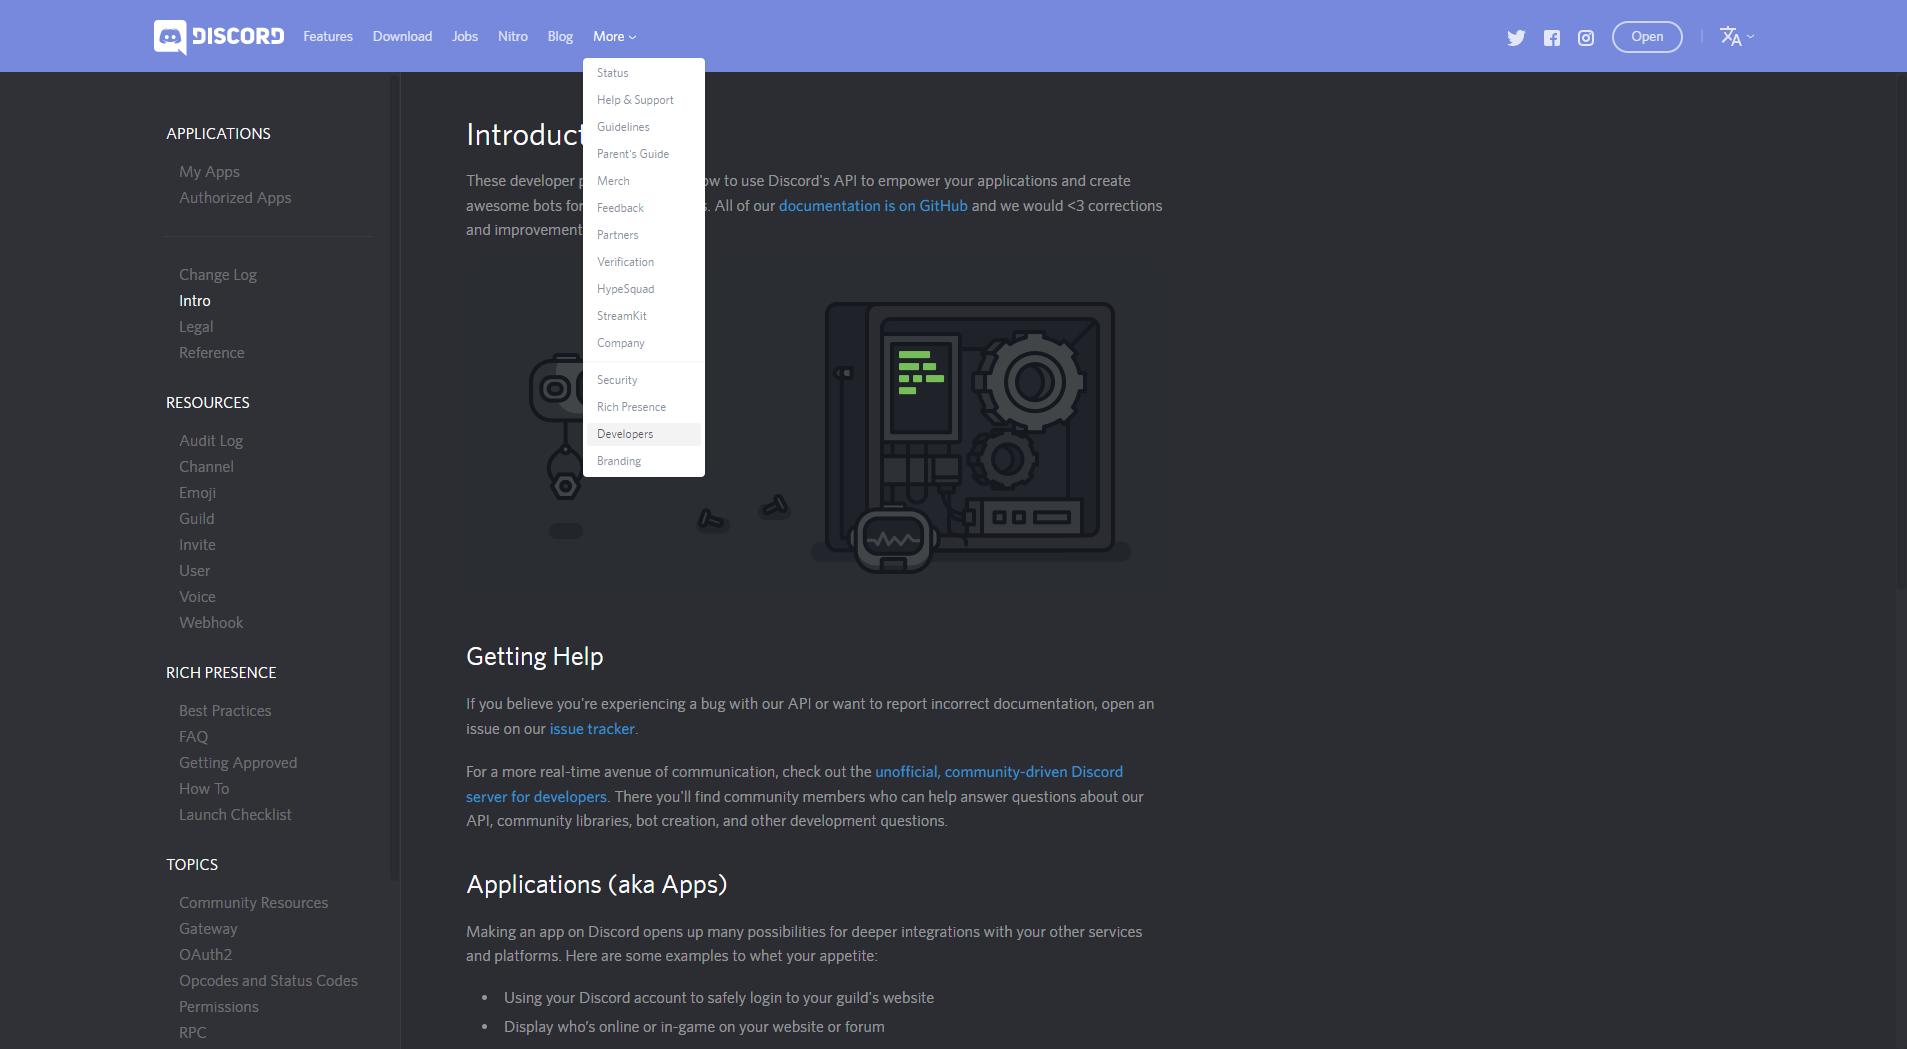 FireShot Capture 19 - Discord - Developer Documentat_ - https___discordapp.com_developers_docs_intro.png